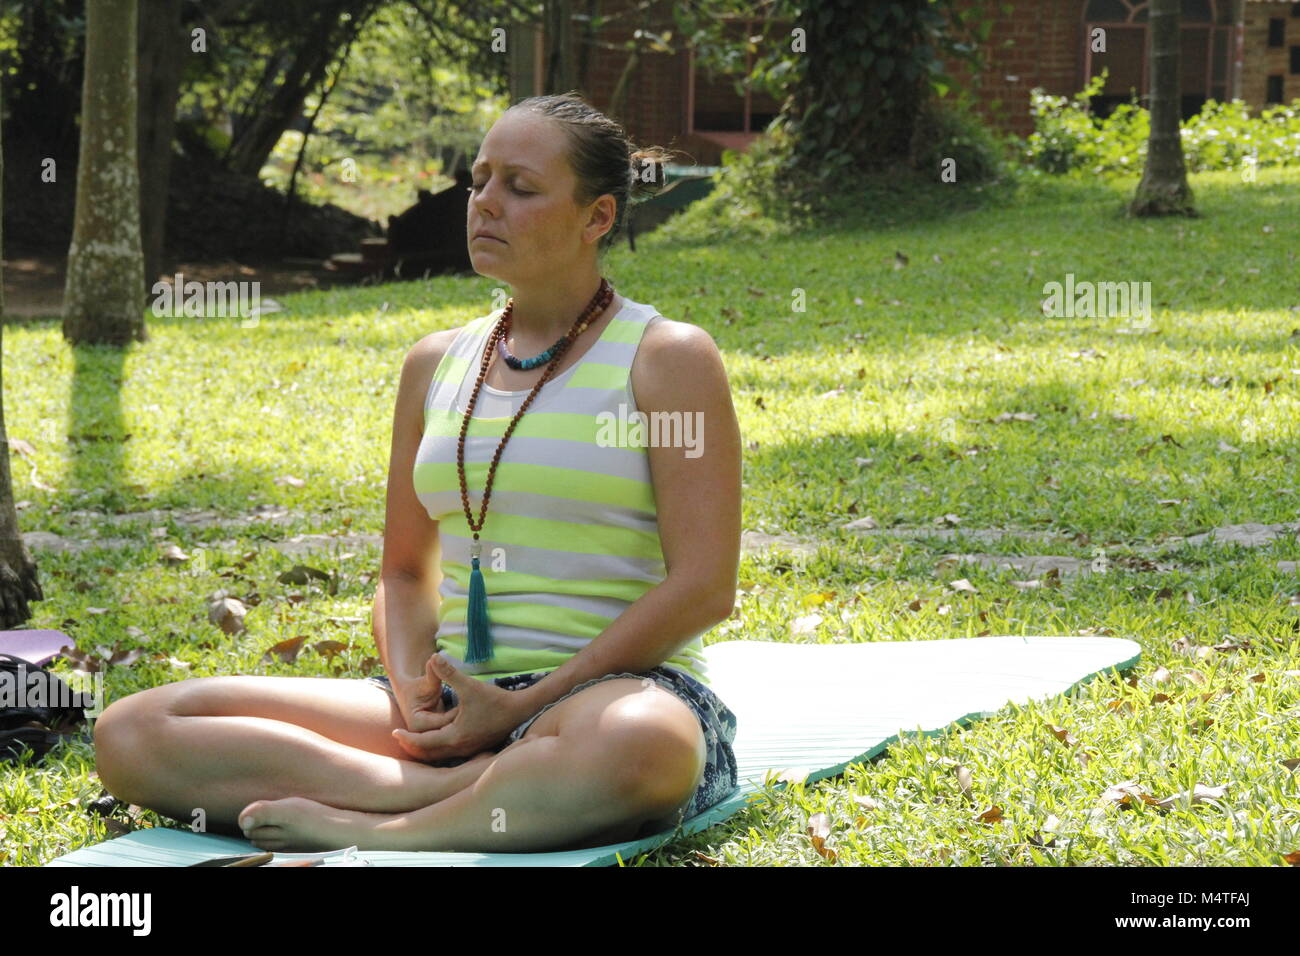 White woman meditating outdoors - Stock Image